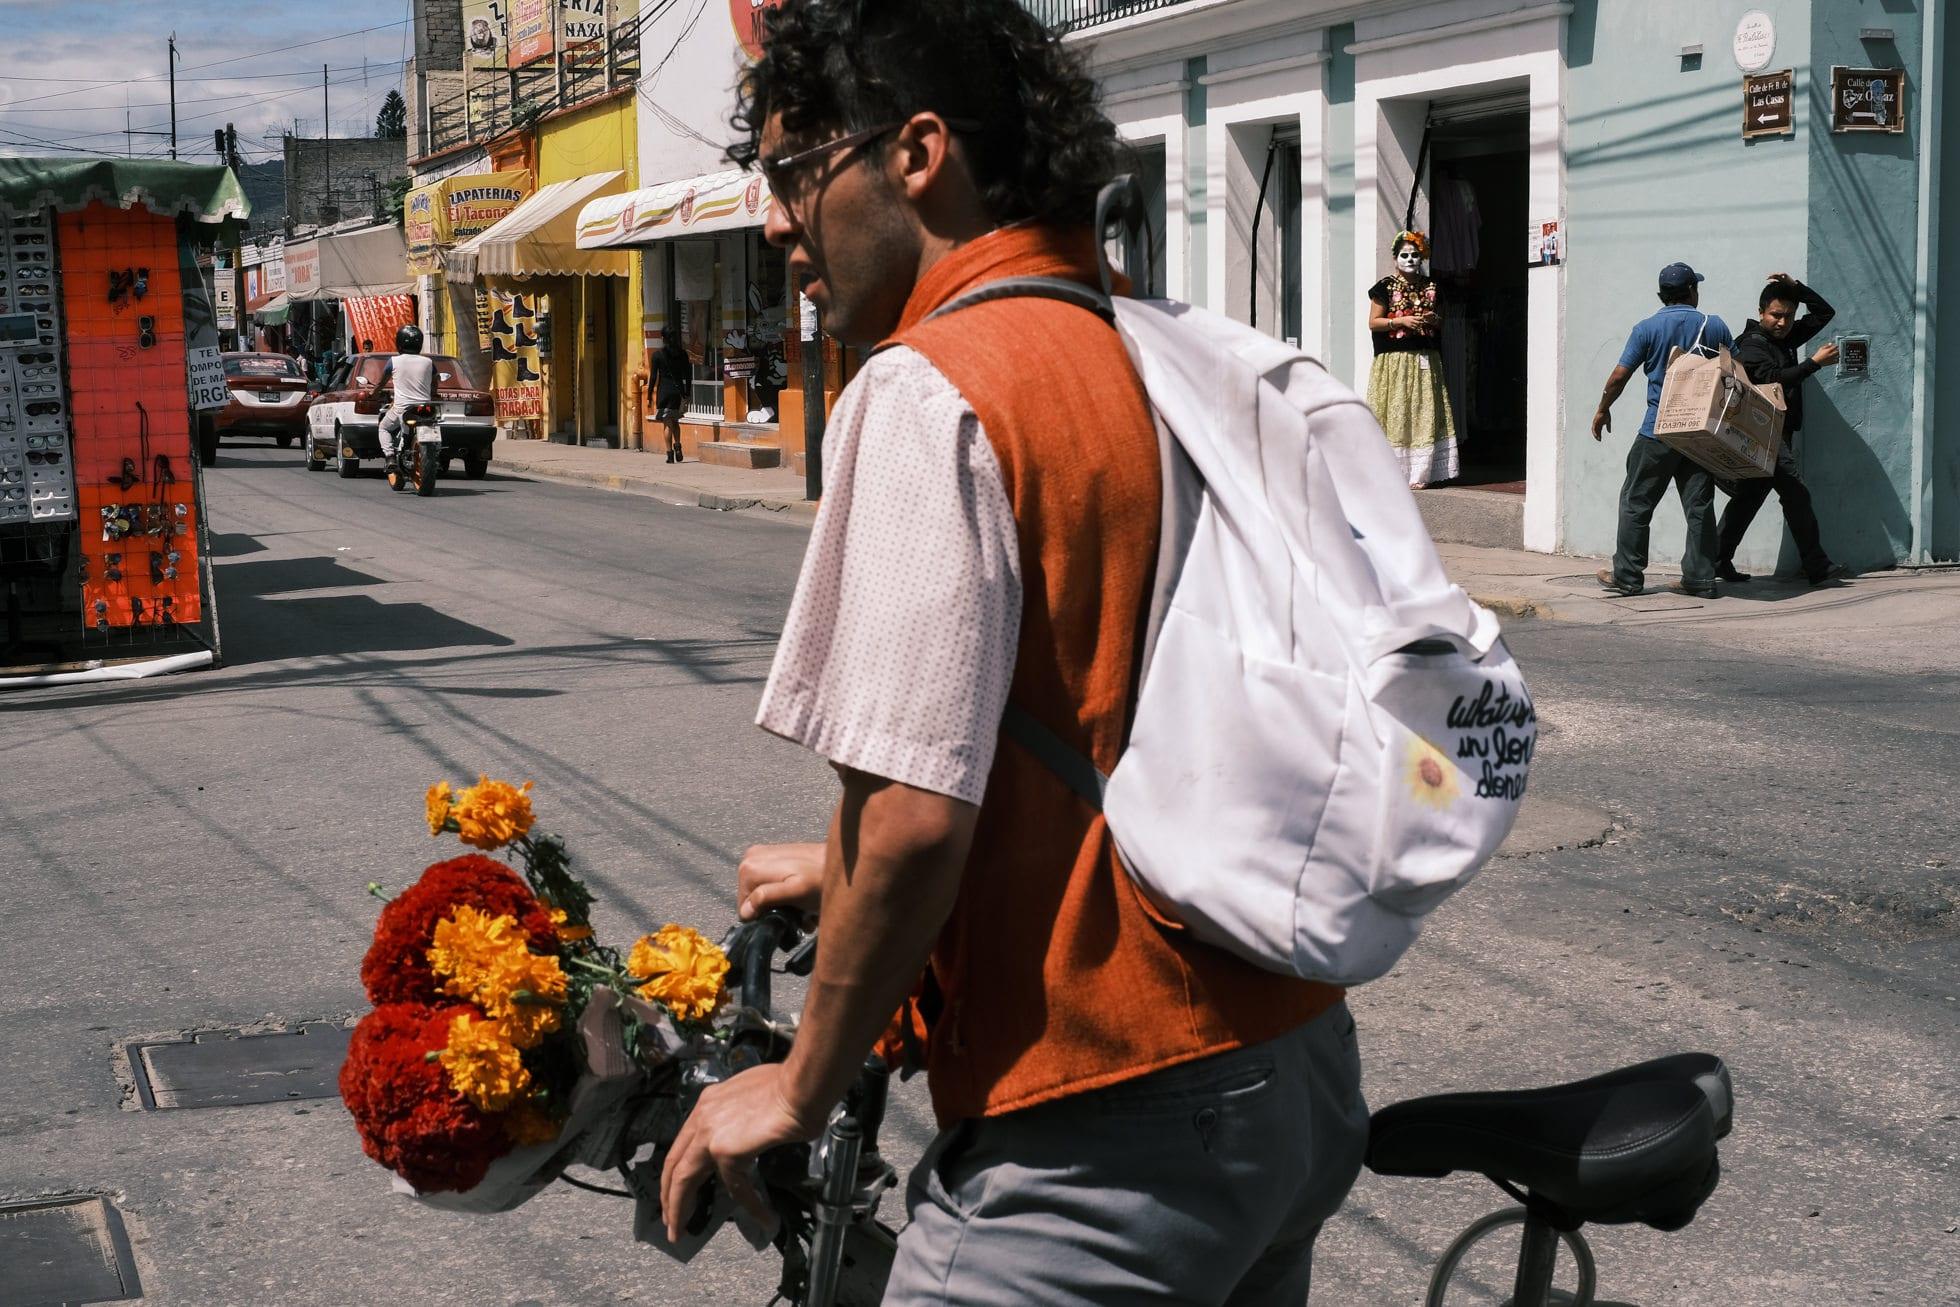 fujifilm-x-pro3-mexico-street-photography-80